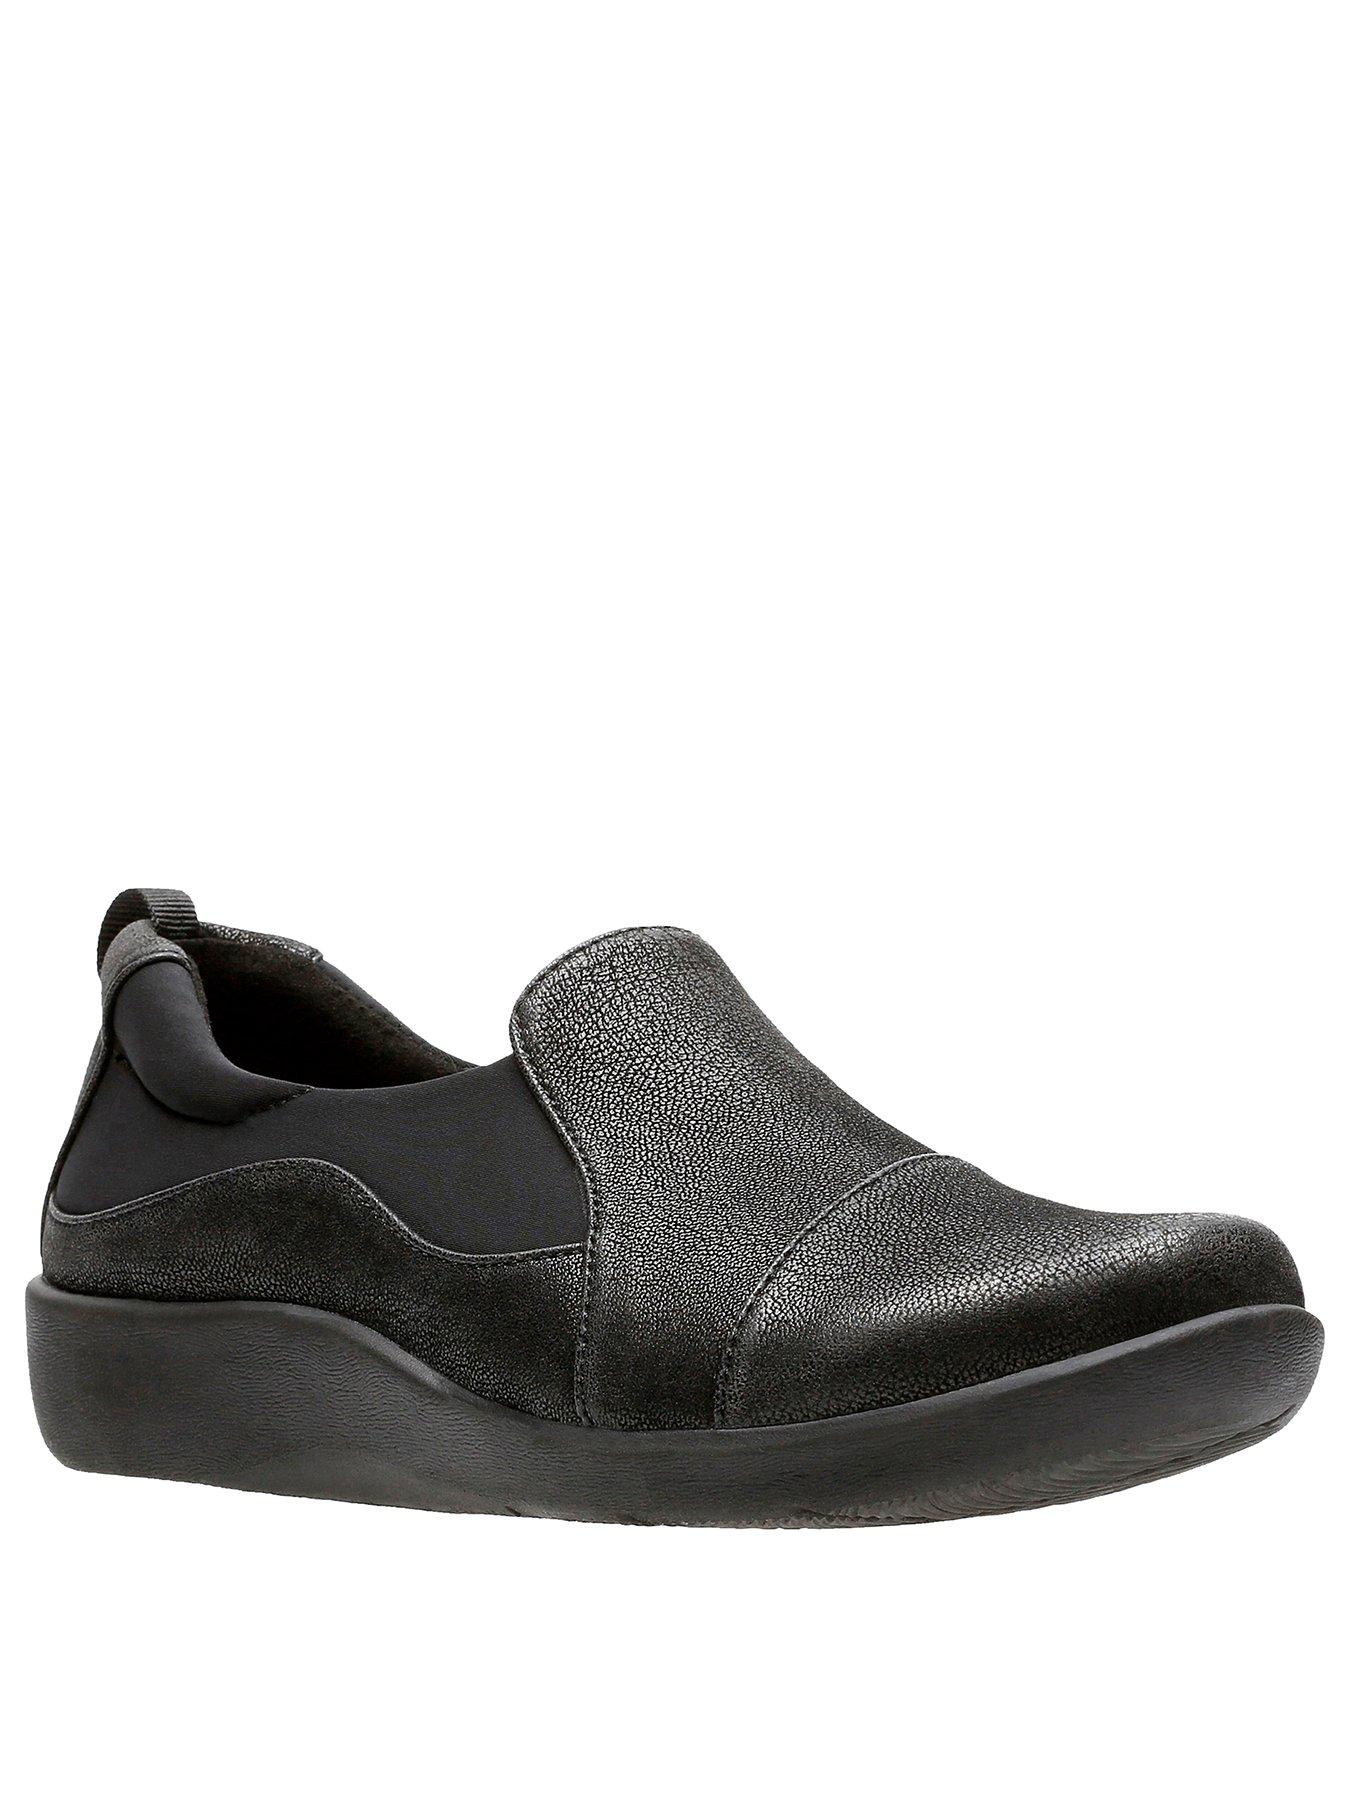 Women | Clarks Shoes | Littlewoods